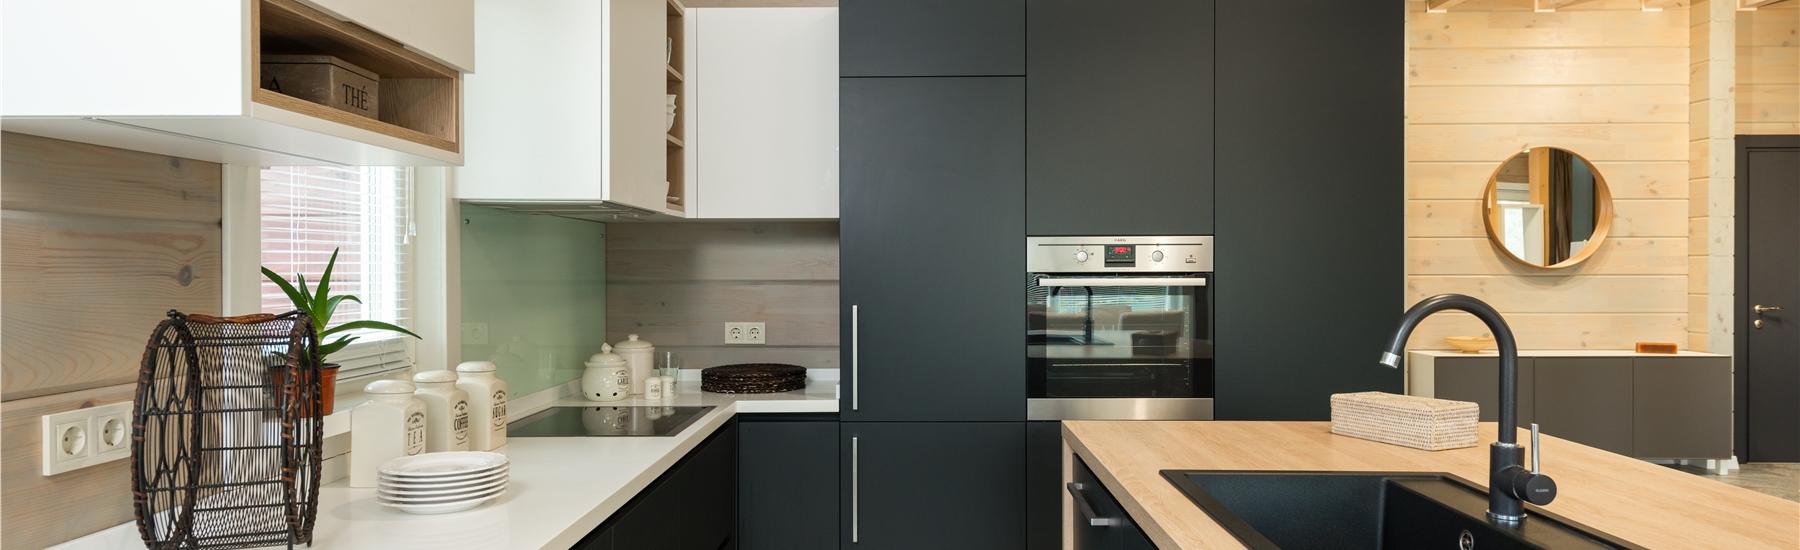 Kitchen with reflective backsplashes and small circular mirror